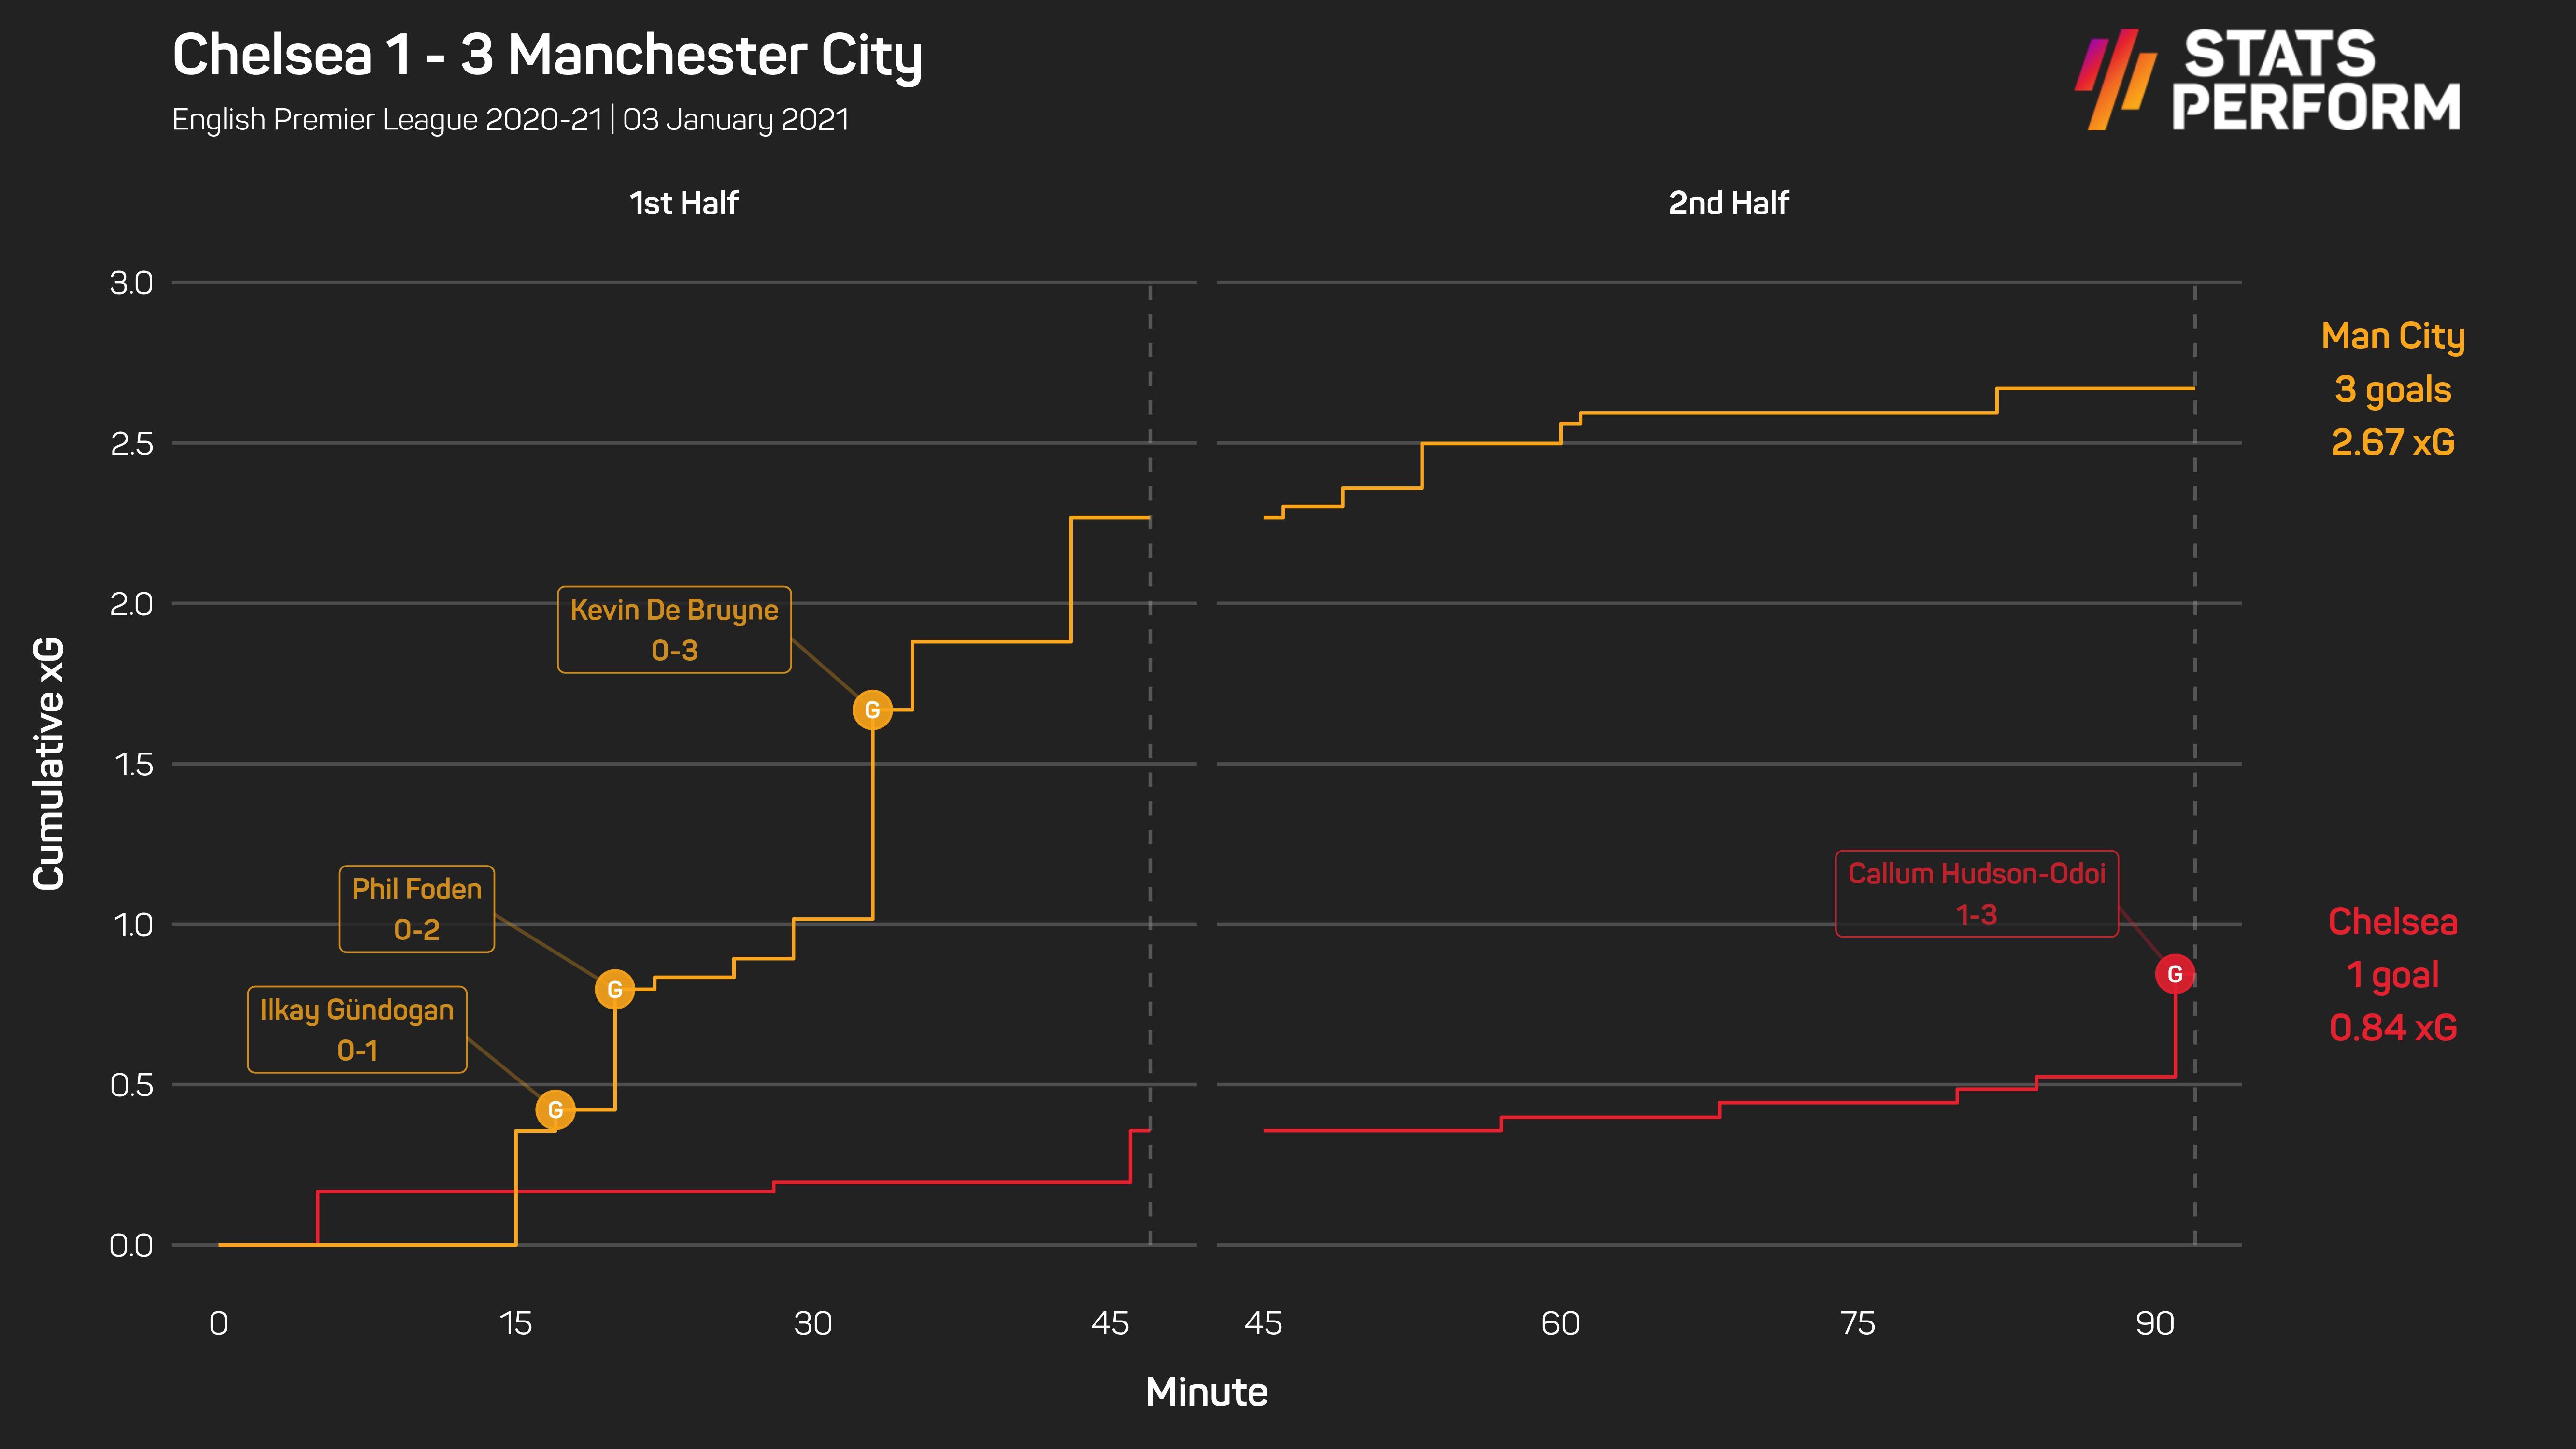 Chelsea 1-3 Man City